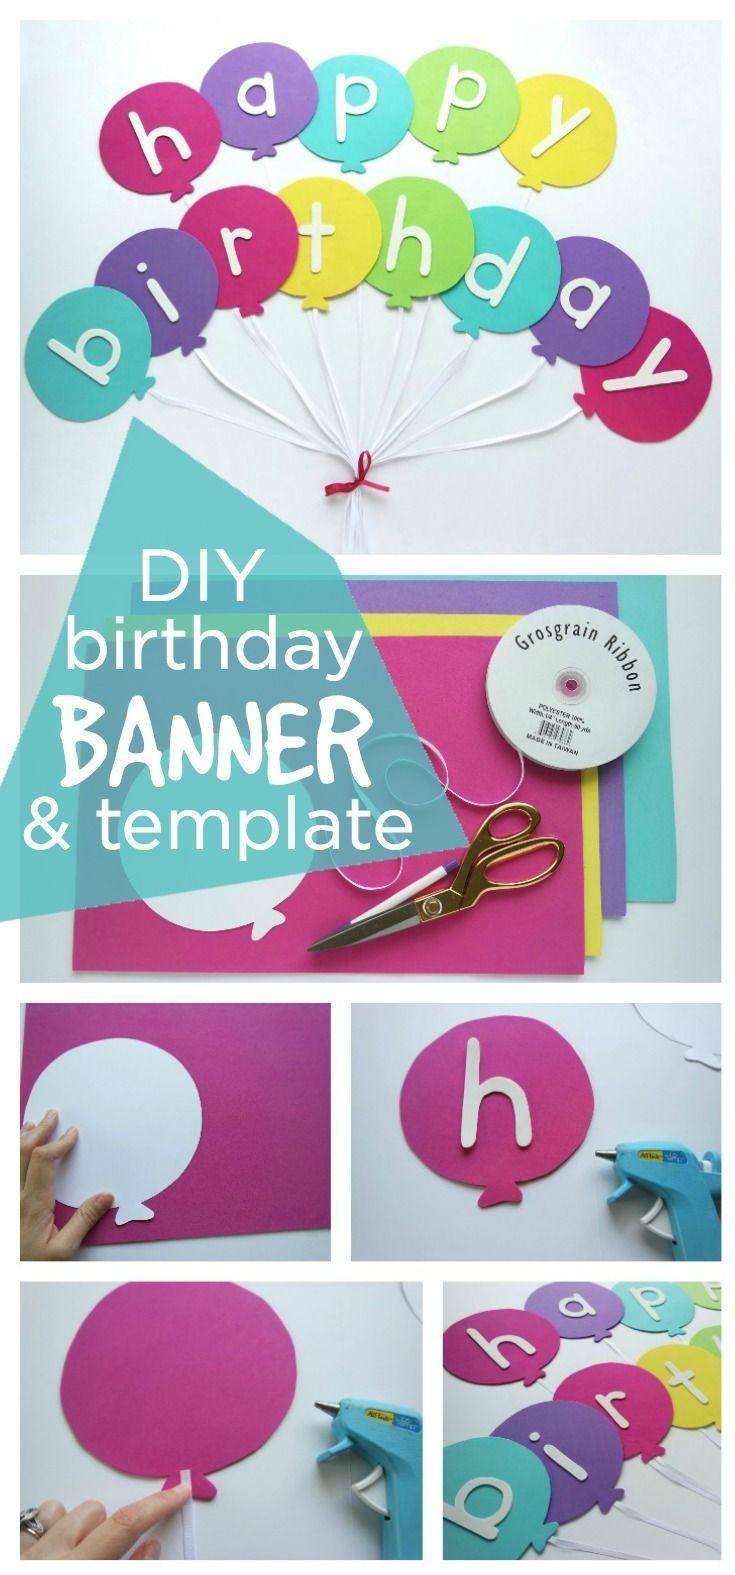 Happy Birthday Banner Diy Template Diy Party Ideas Group Board